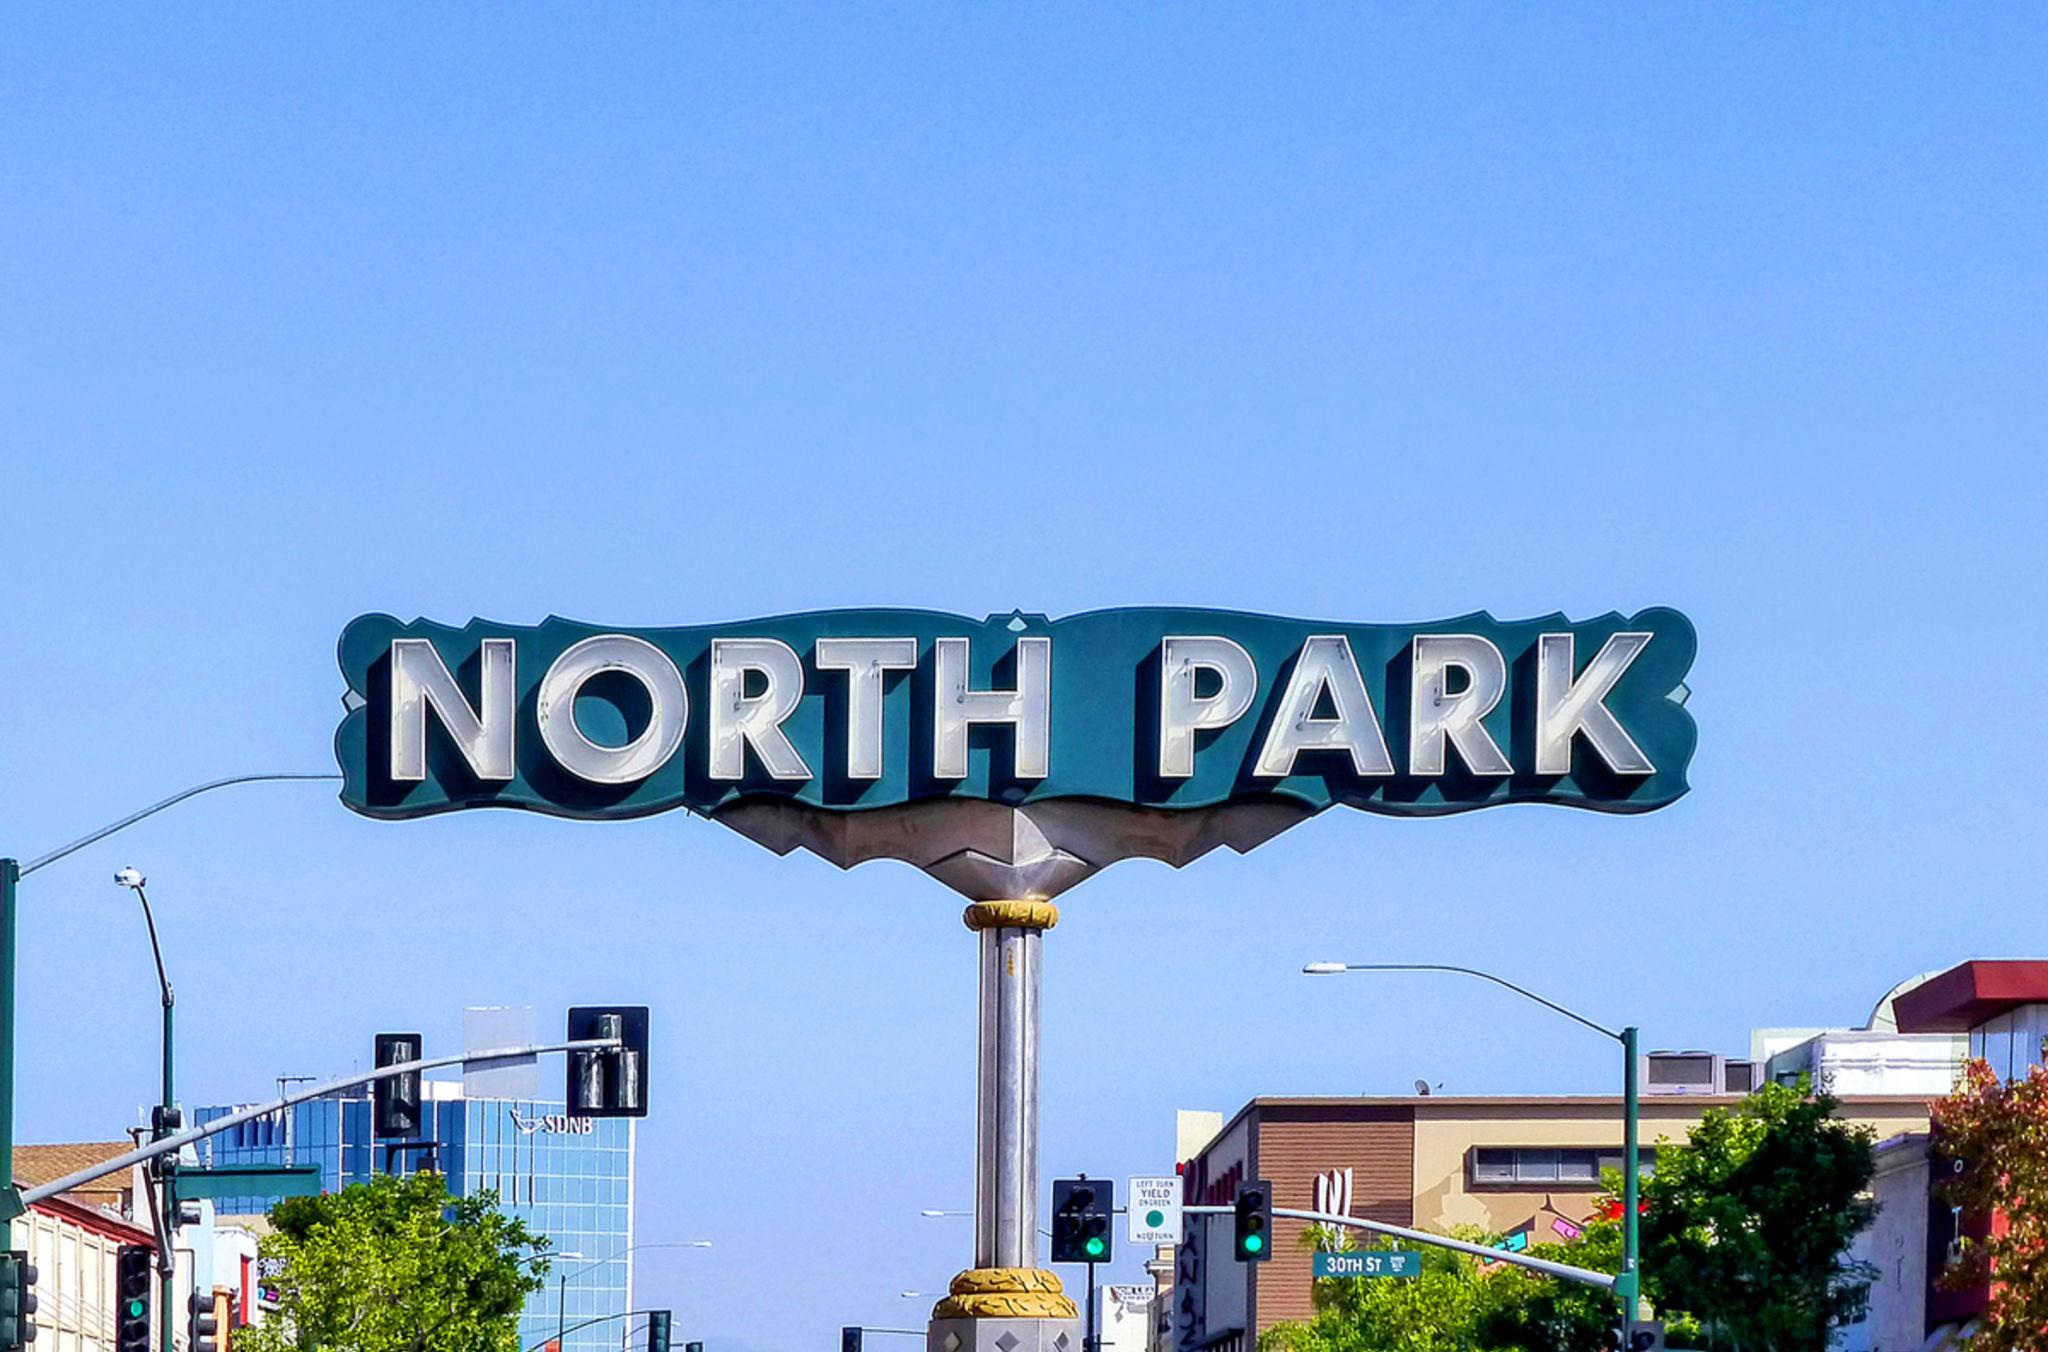 Sljnl8_north_park___san_diego___92104___201_15358310700_o_web_ipad_pro